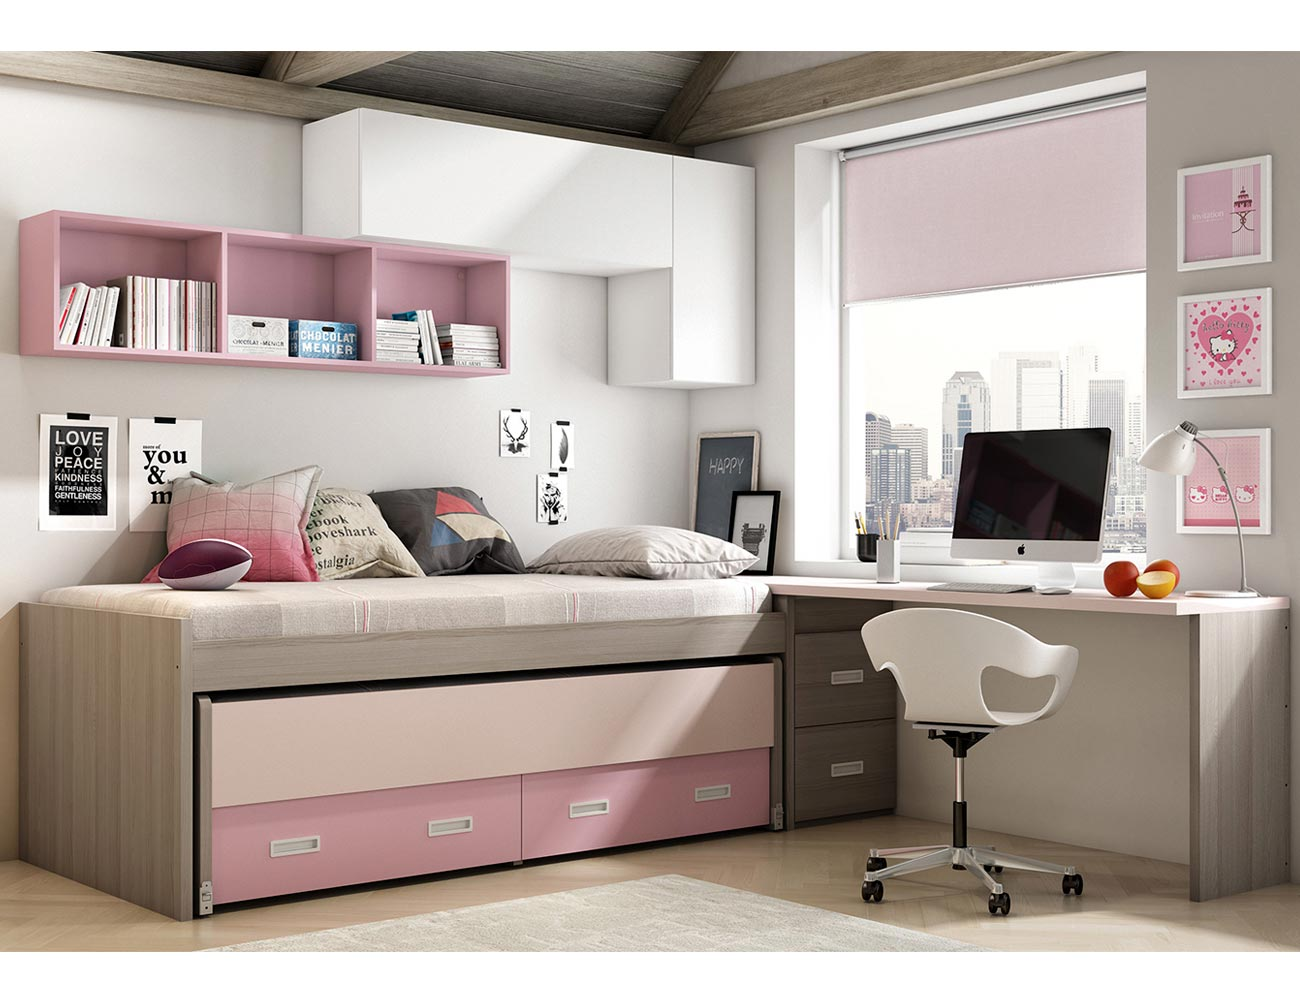 Dormitorio juvenil moderno cama cajones 2